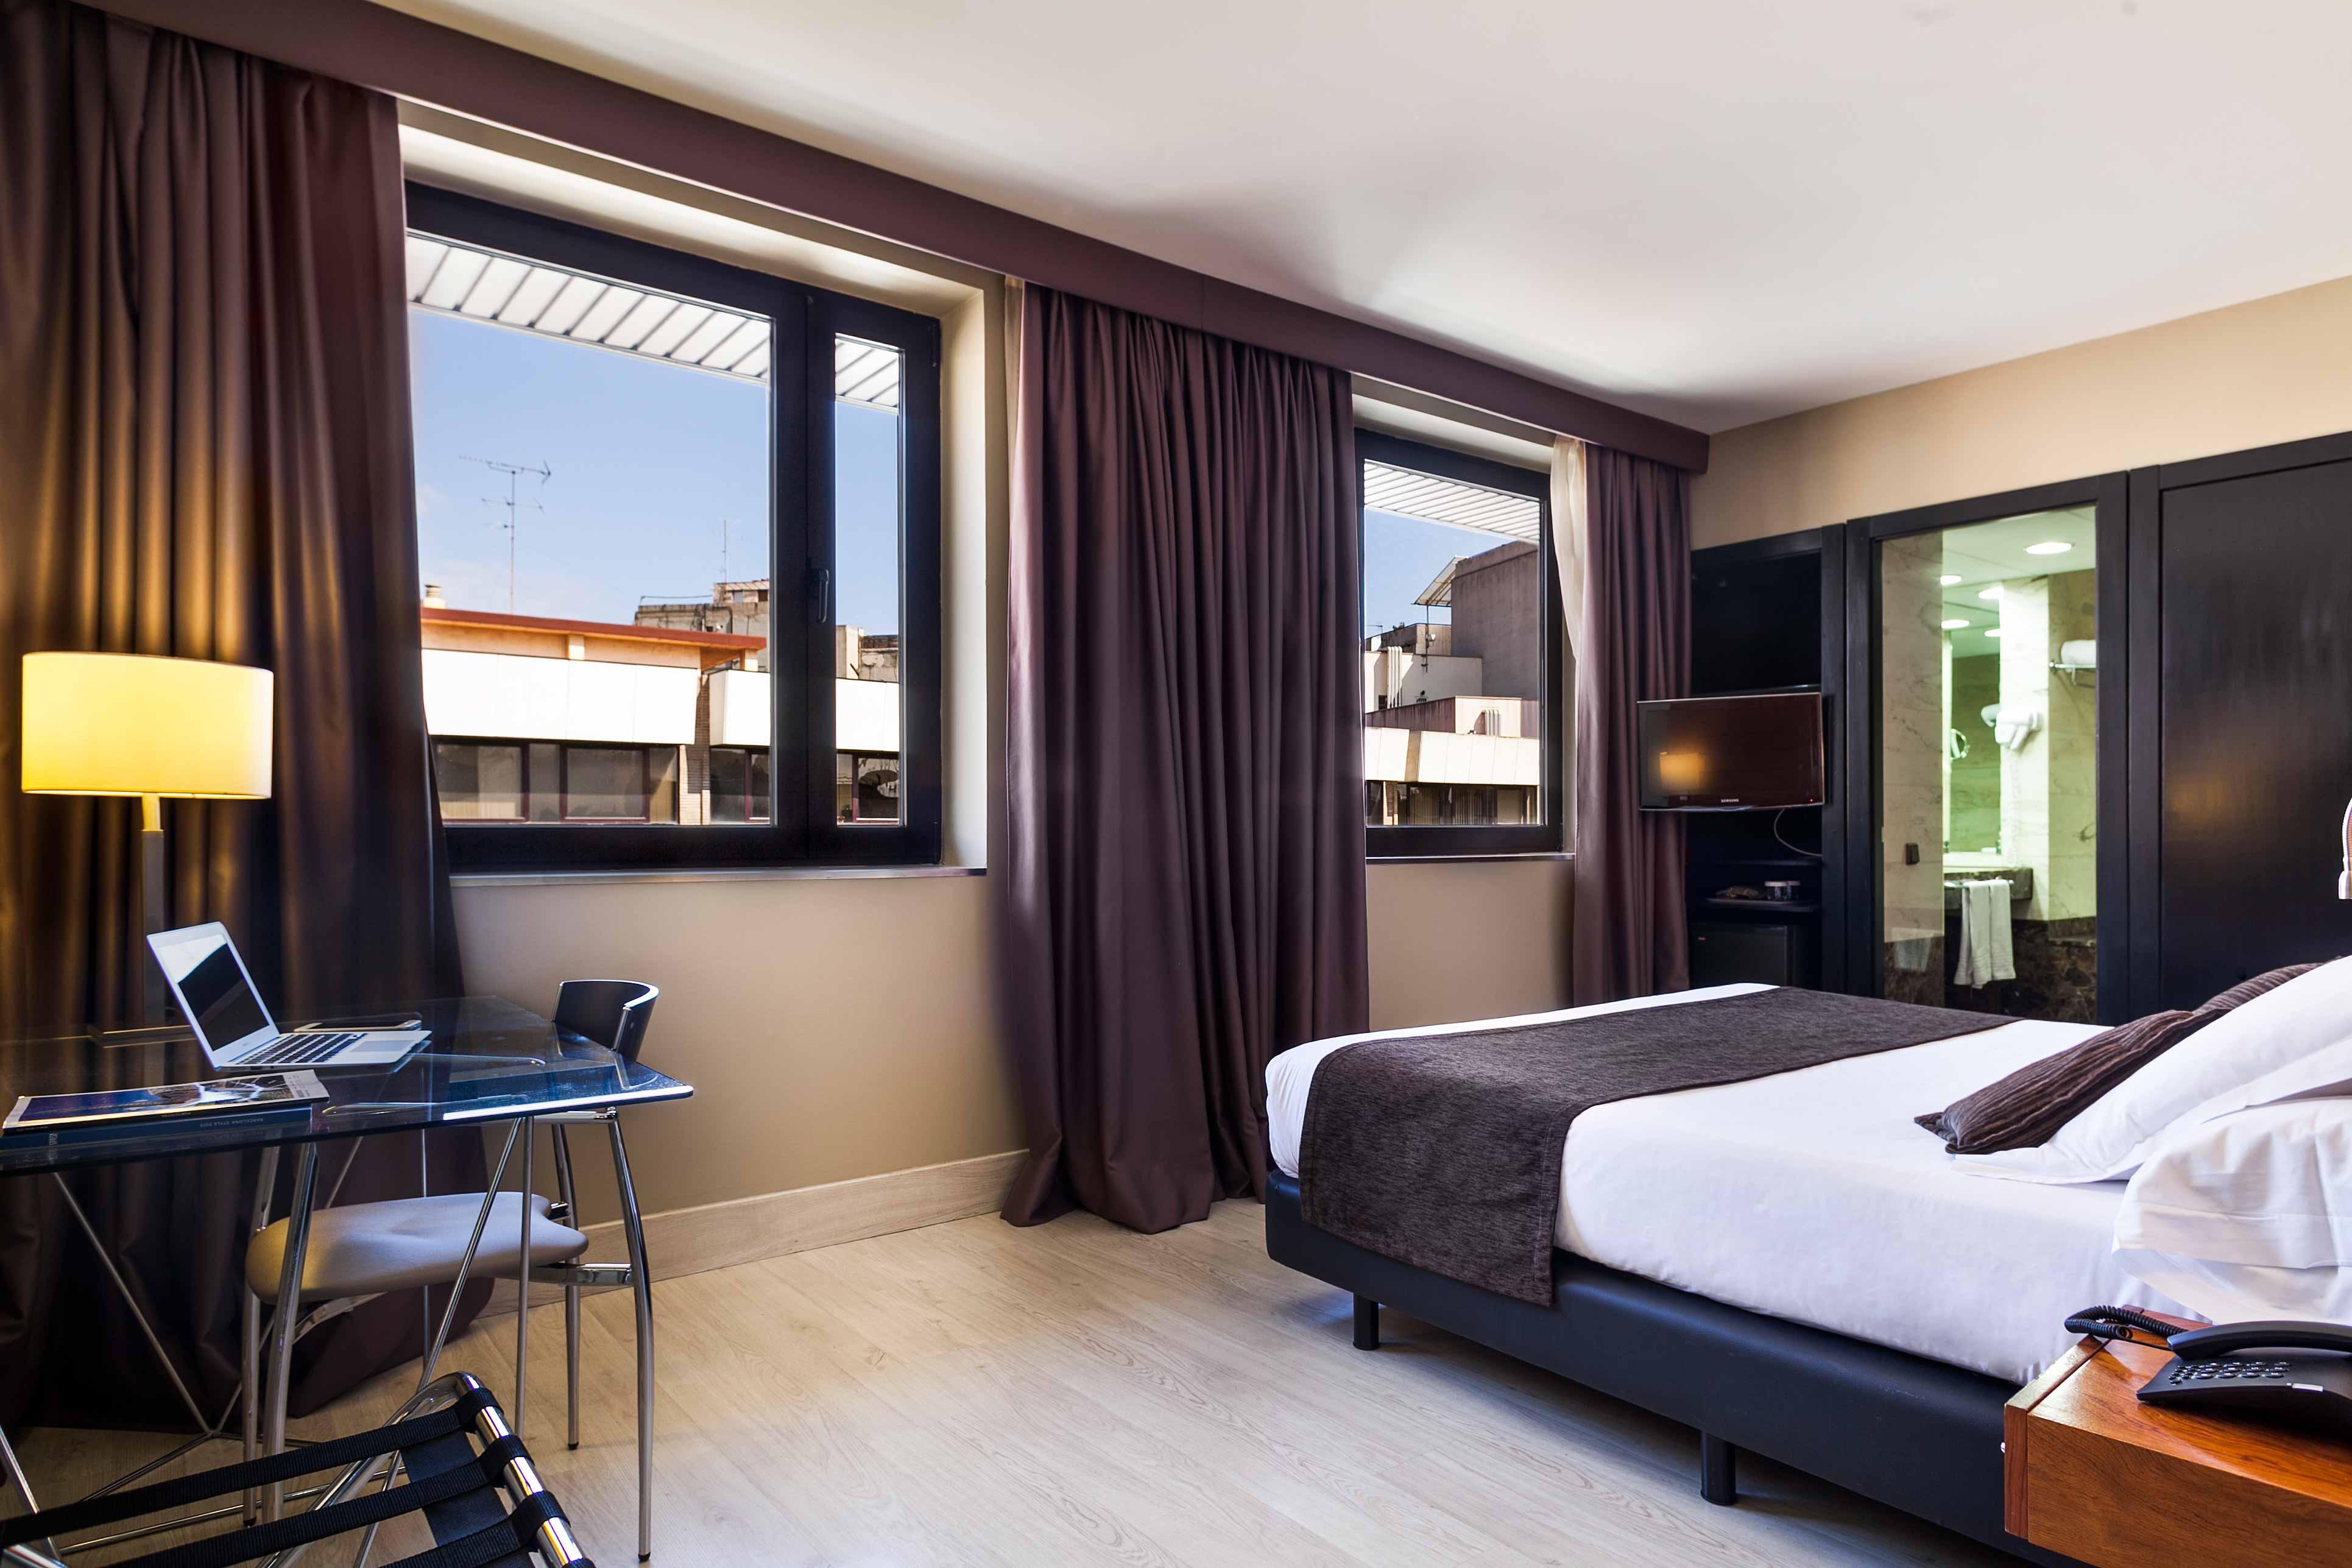 Hotel acta city47 hotel en la estaci n de sants de barcelona for Hoteles barcelona habitaciones cuadruples